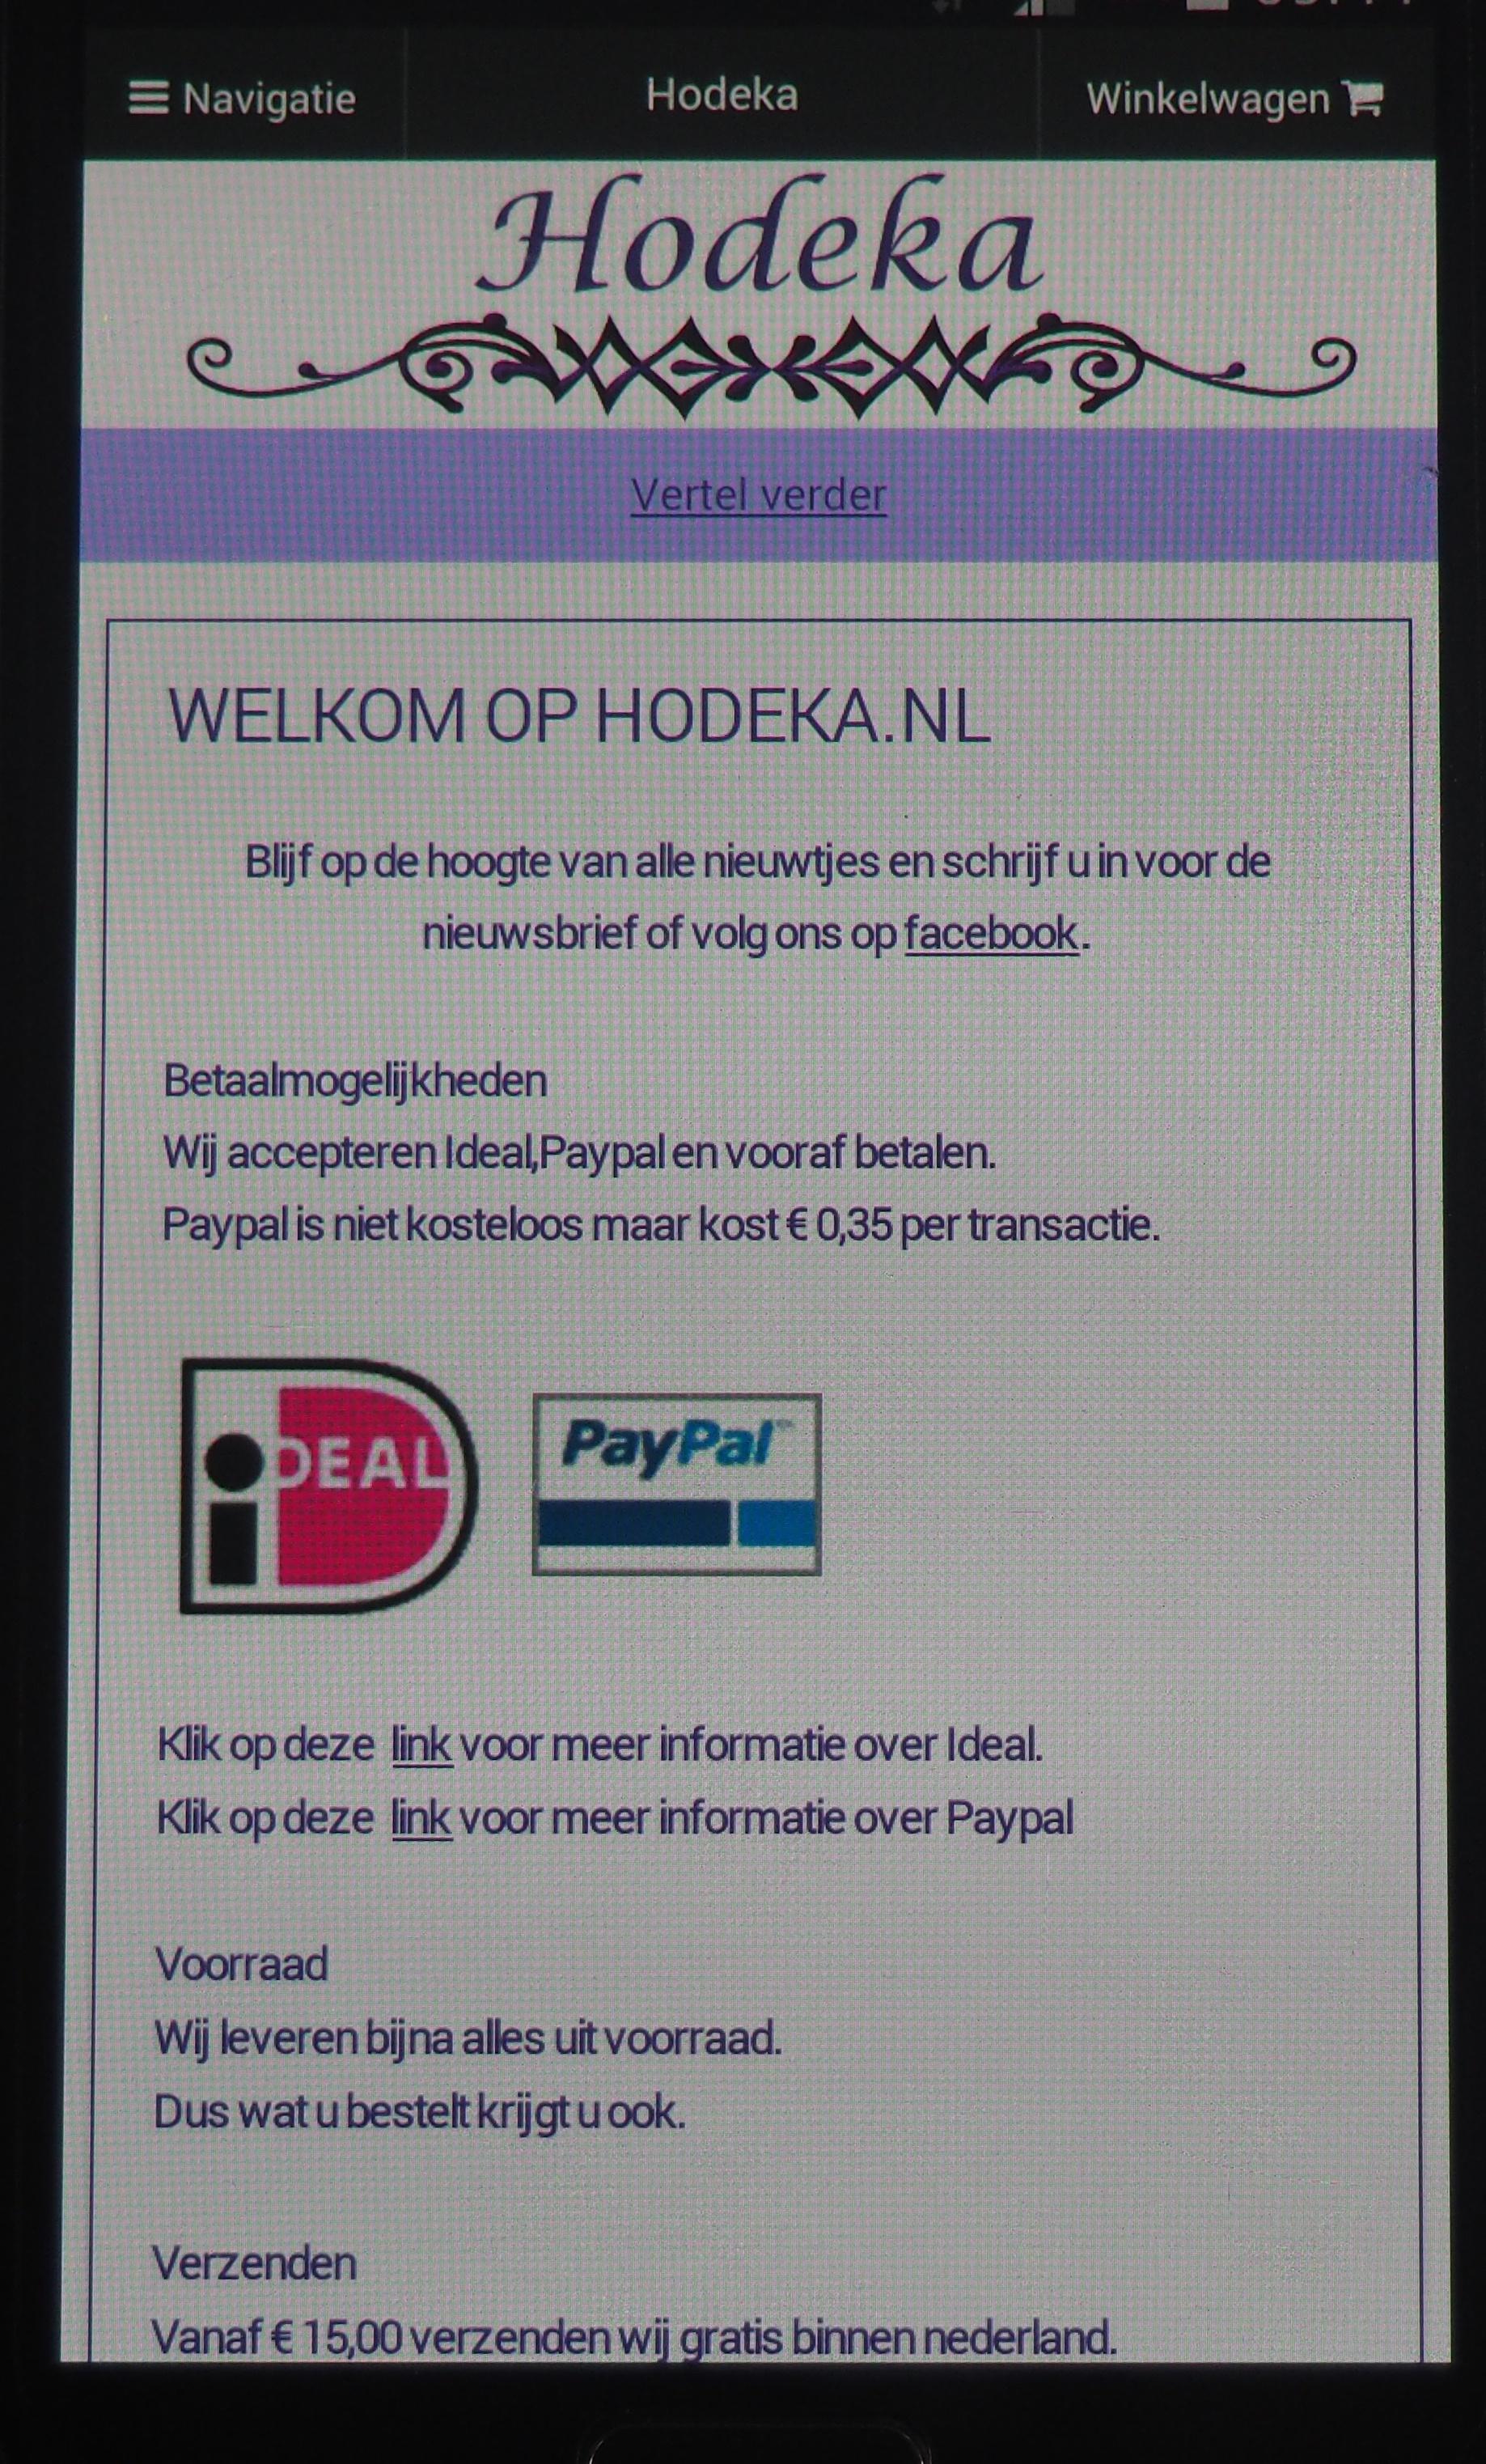 Ga naar www.hodeka.nl